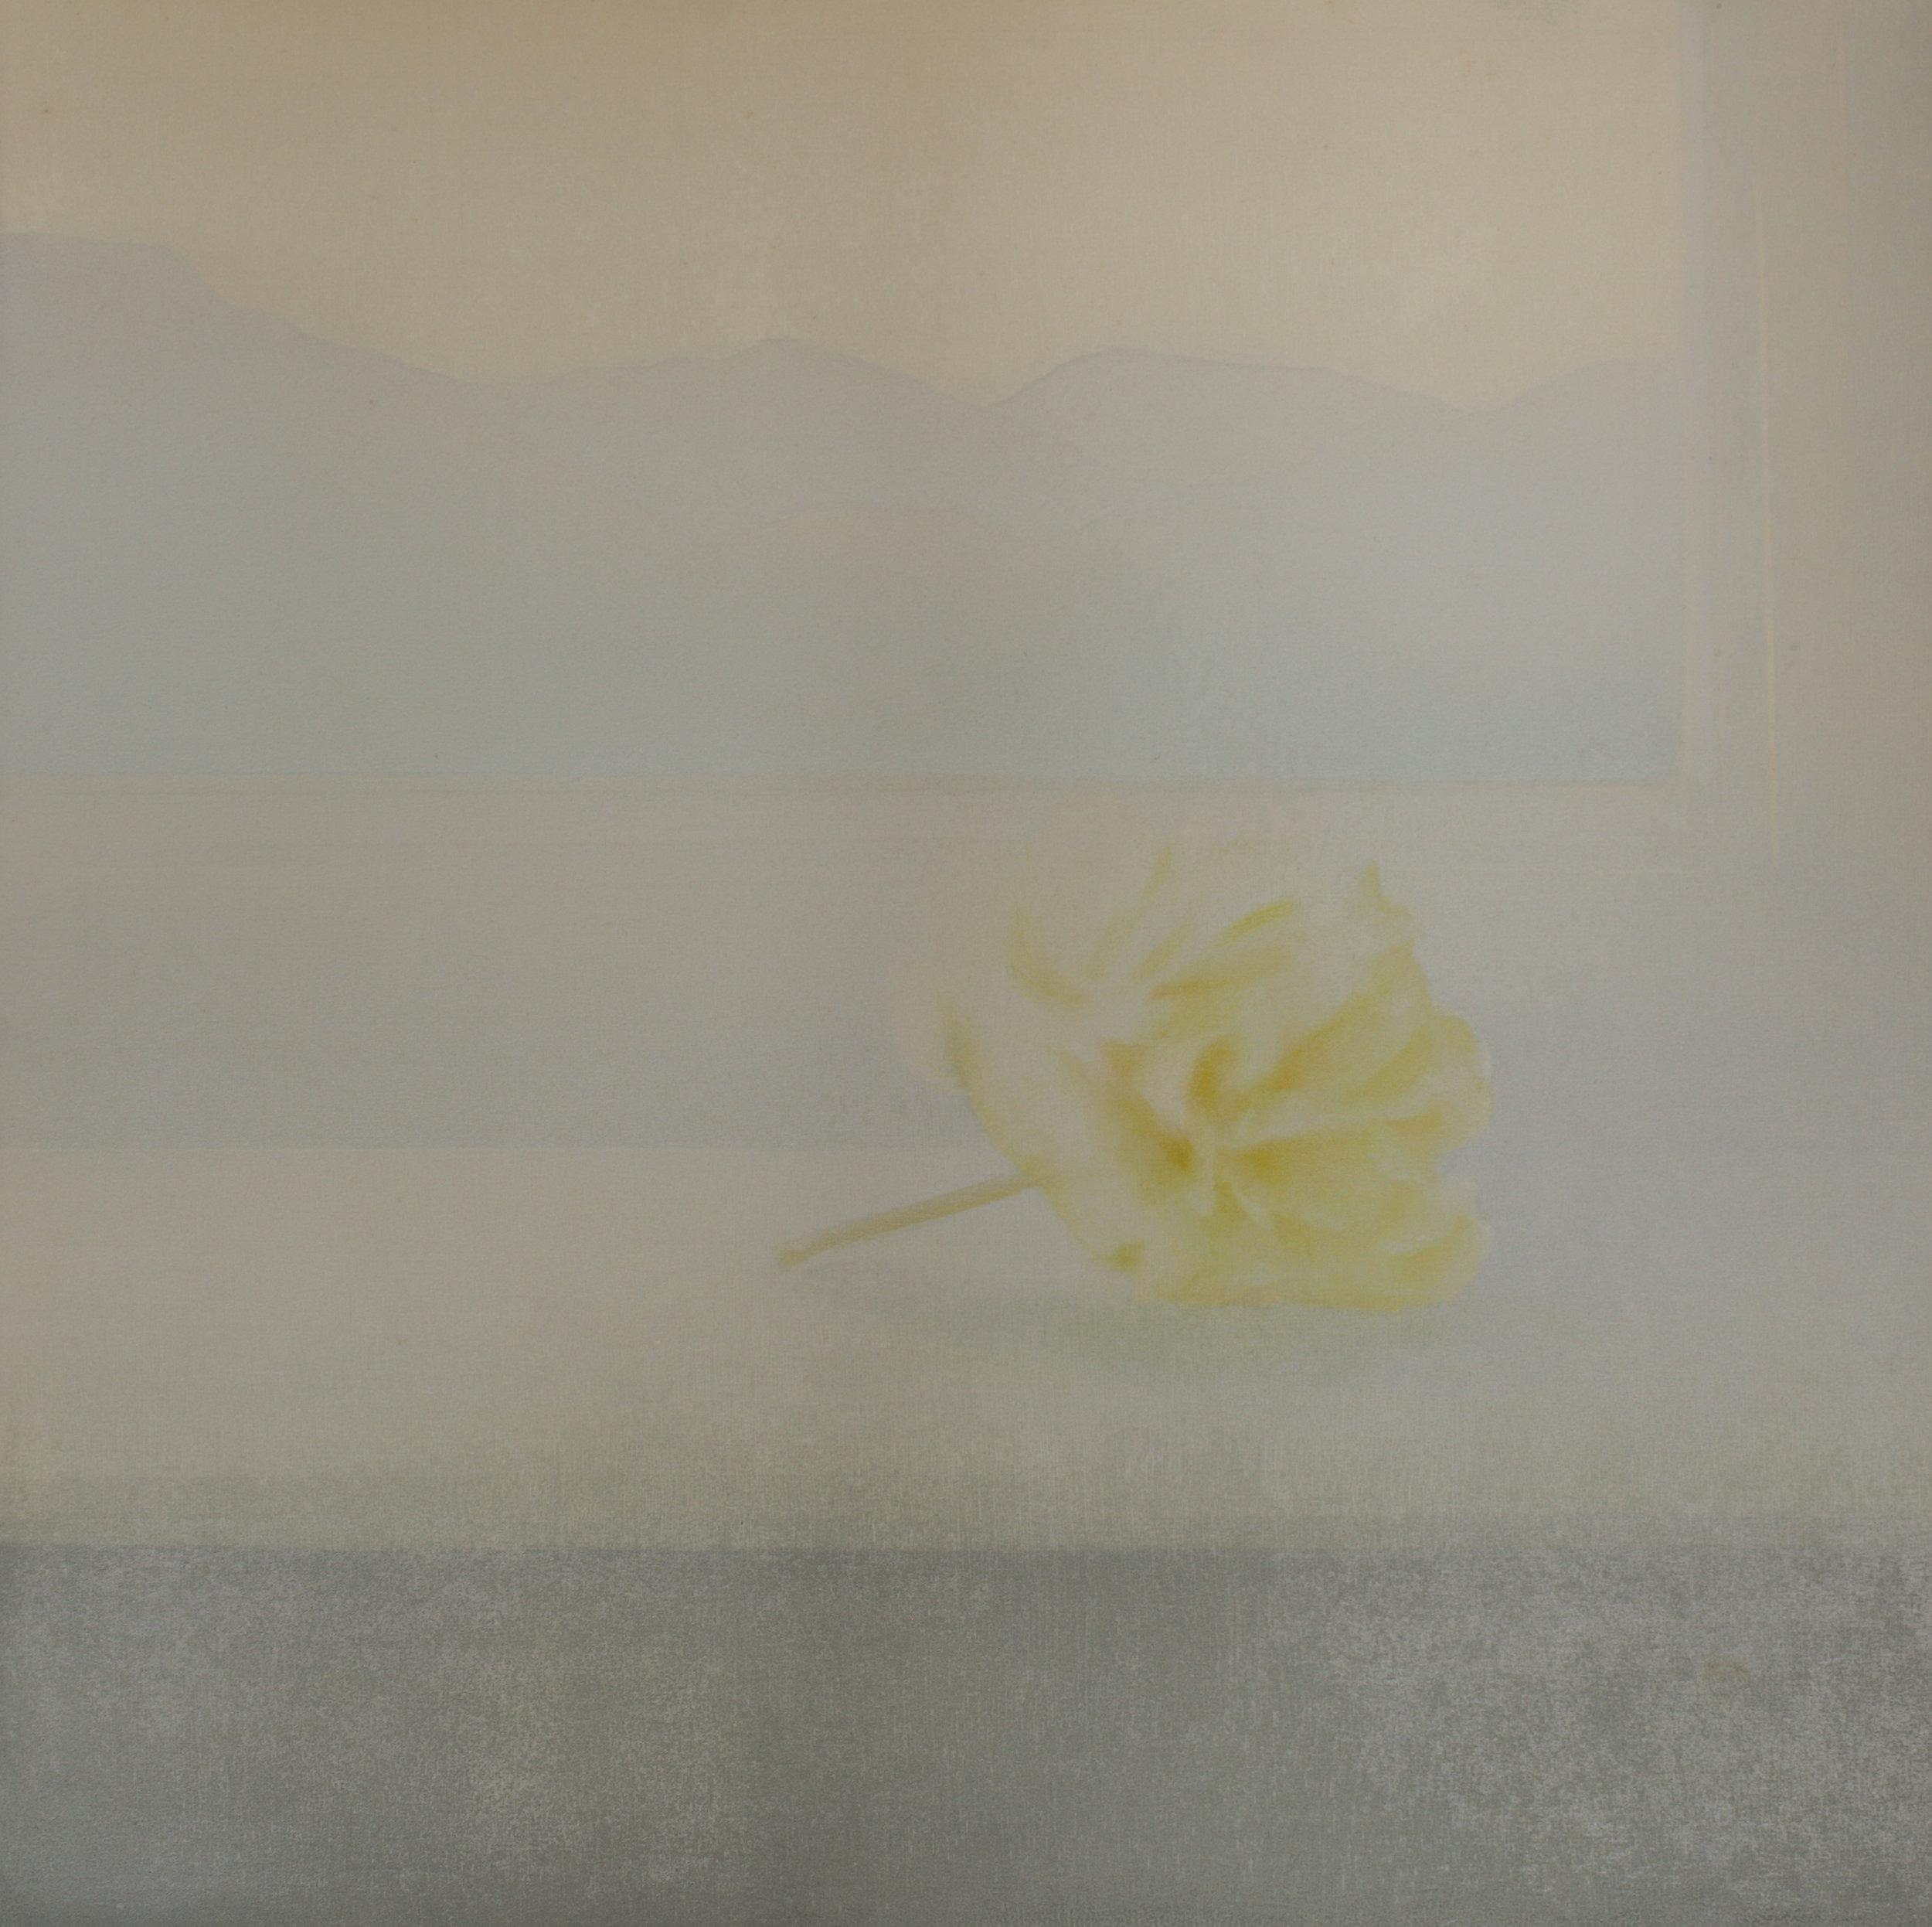 Praween PIANGCHOOMPU, Serenity #1, 2017, Woodcut on Paper, 3 of 5, 61 x 61.5 cm